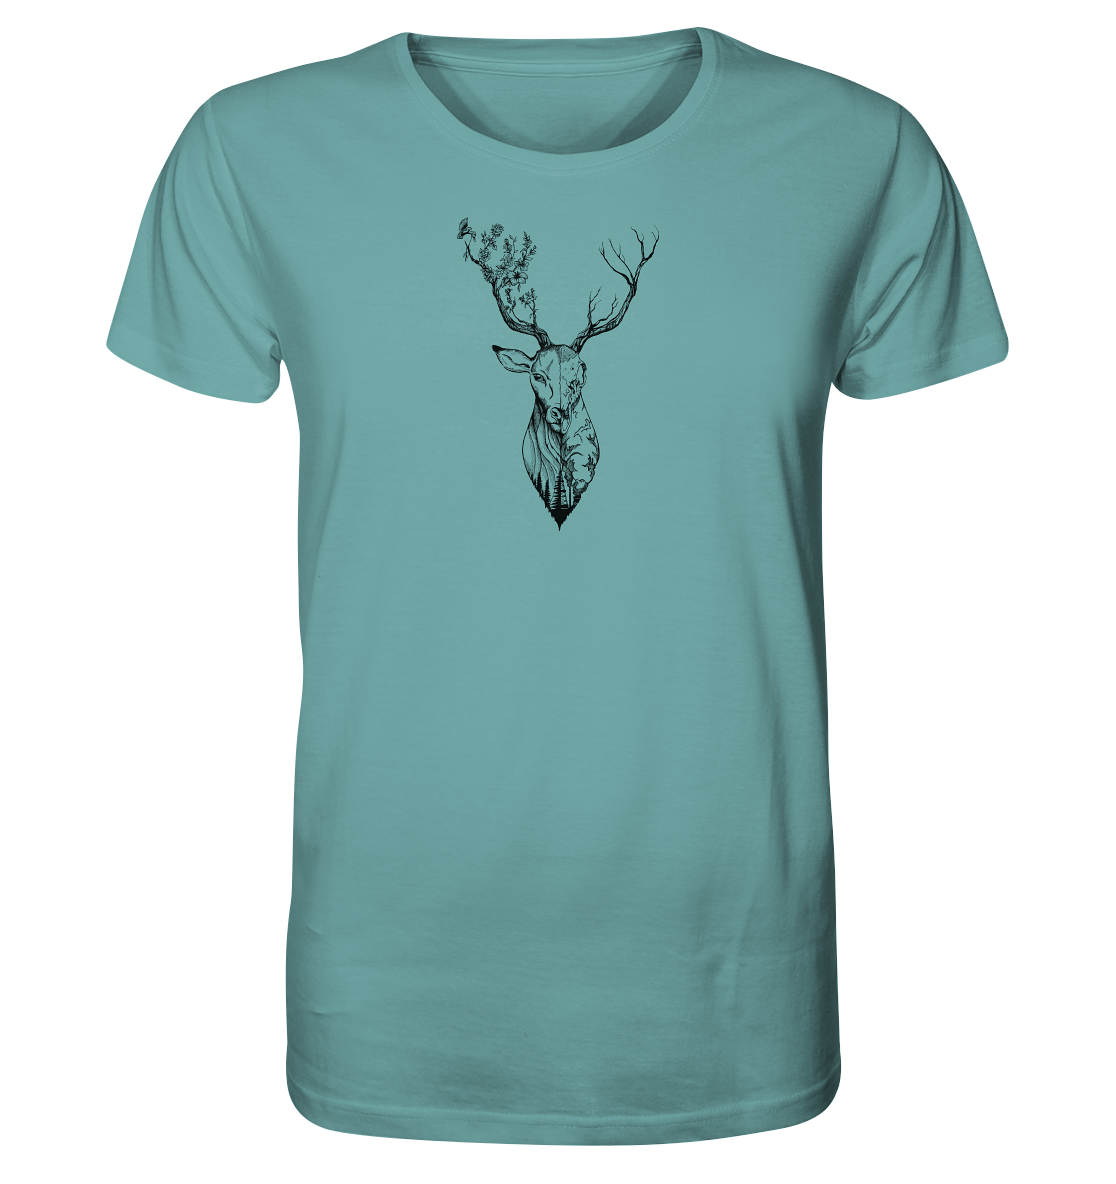 front-organic-shirt-70a7a7-1116x-7.png